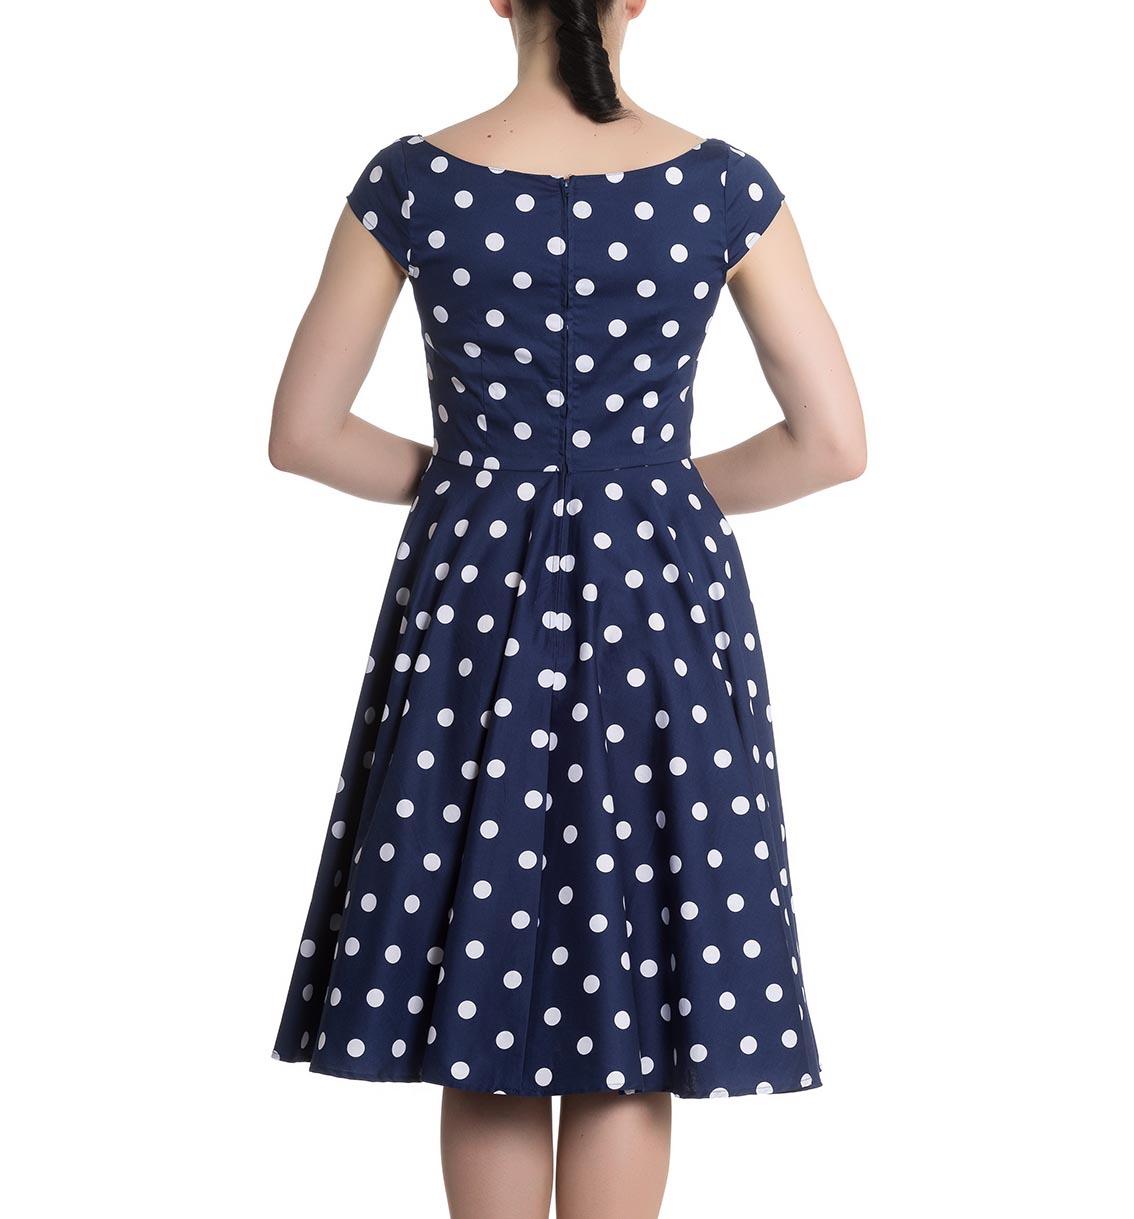 Hell-Bunny-50s-Dress-Polka-Dot-NICKY-Pin-Up-Rockabilly-Navy-Blue-All-Sizes thumbnail 13